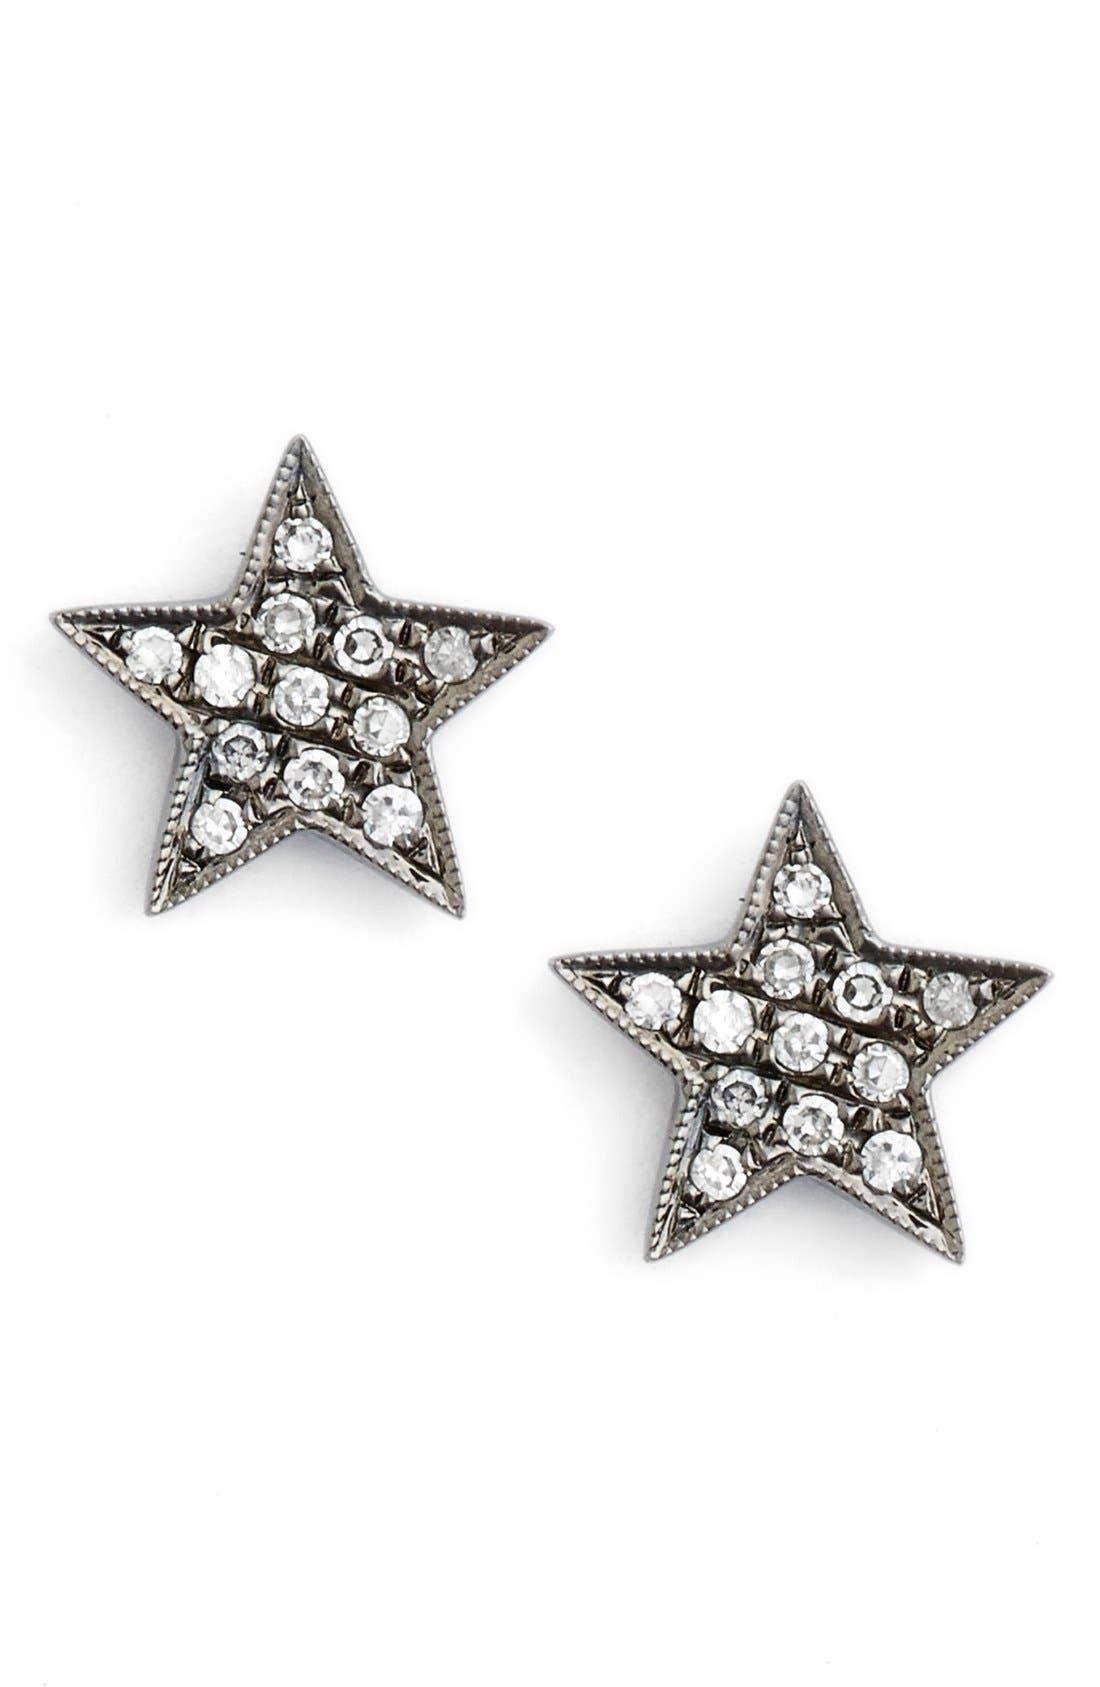 'Julianne Himiko' Diamond Star Stud Earrings,                             Main thumbnail 1, color,                             001